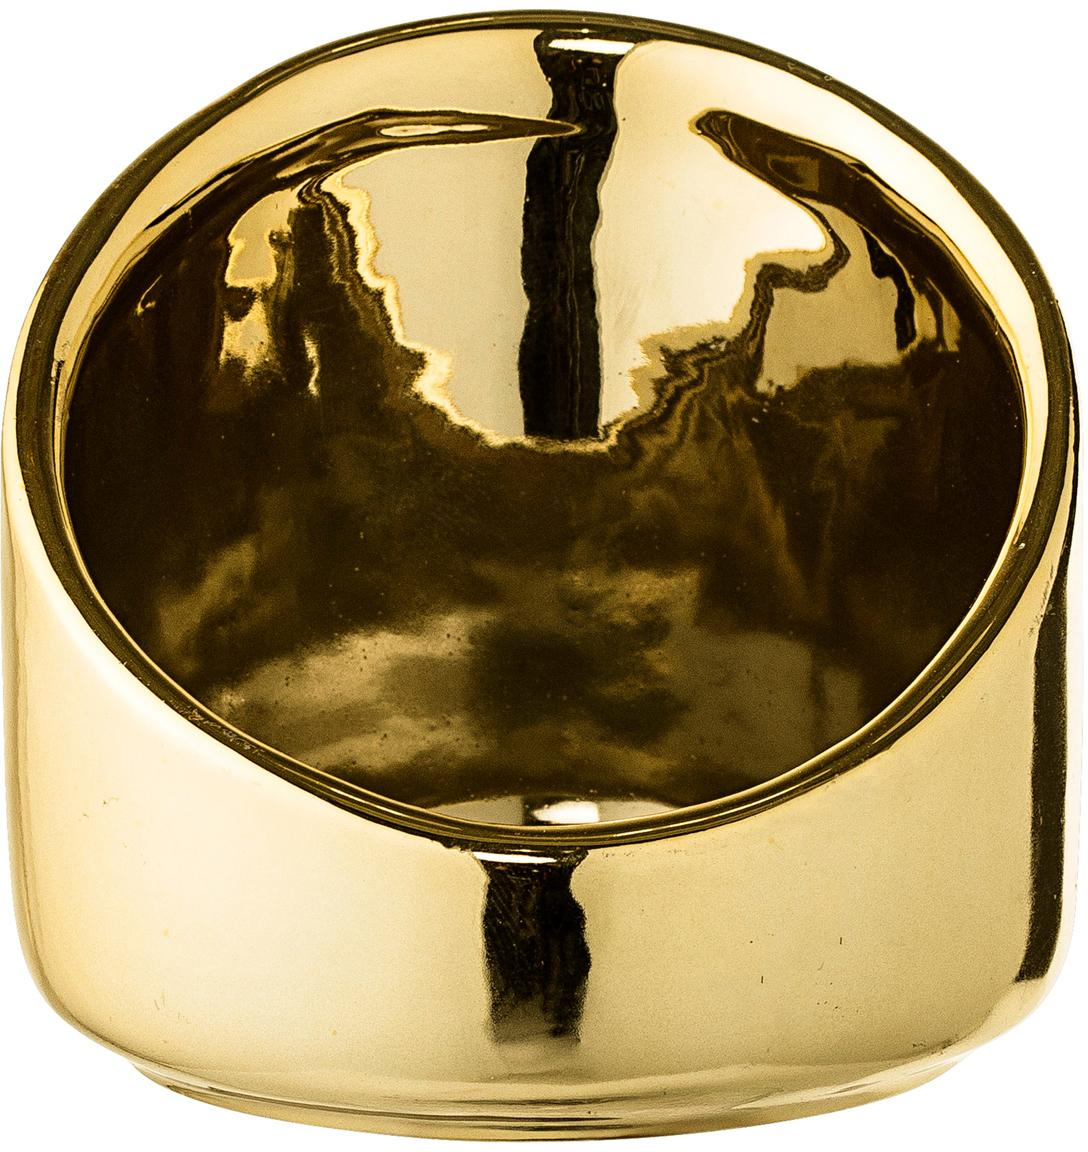 Waxinelichthouder Mara, Keramiek, Goudkleurig, Ø 8 x H 8 cm